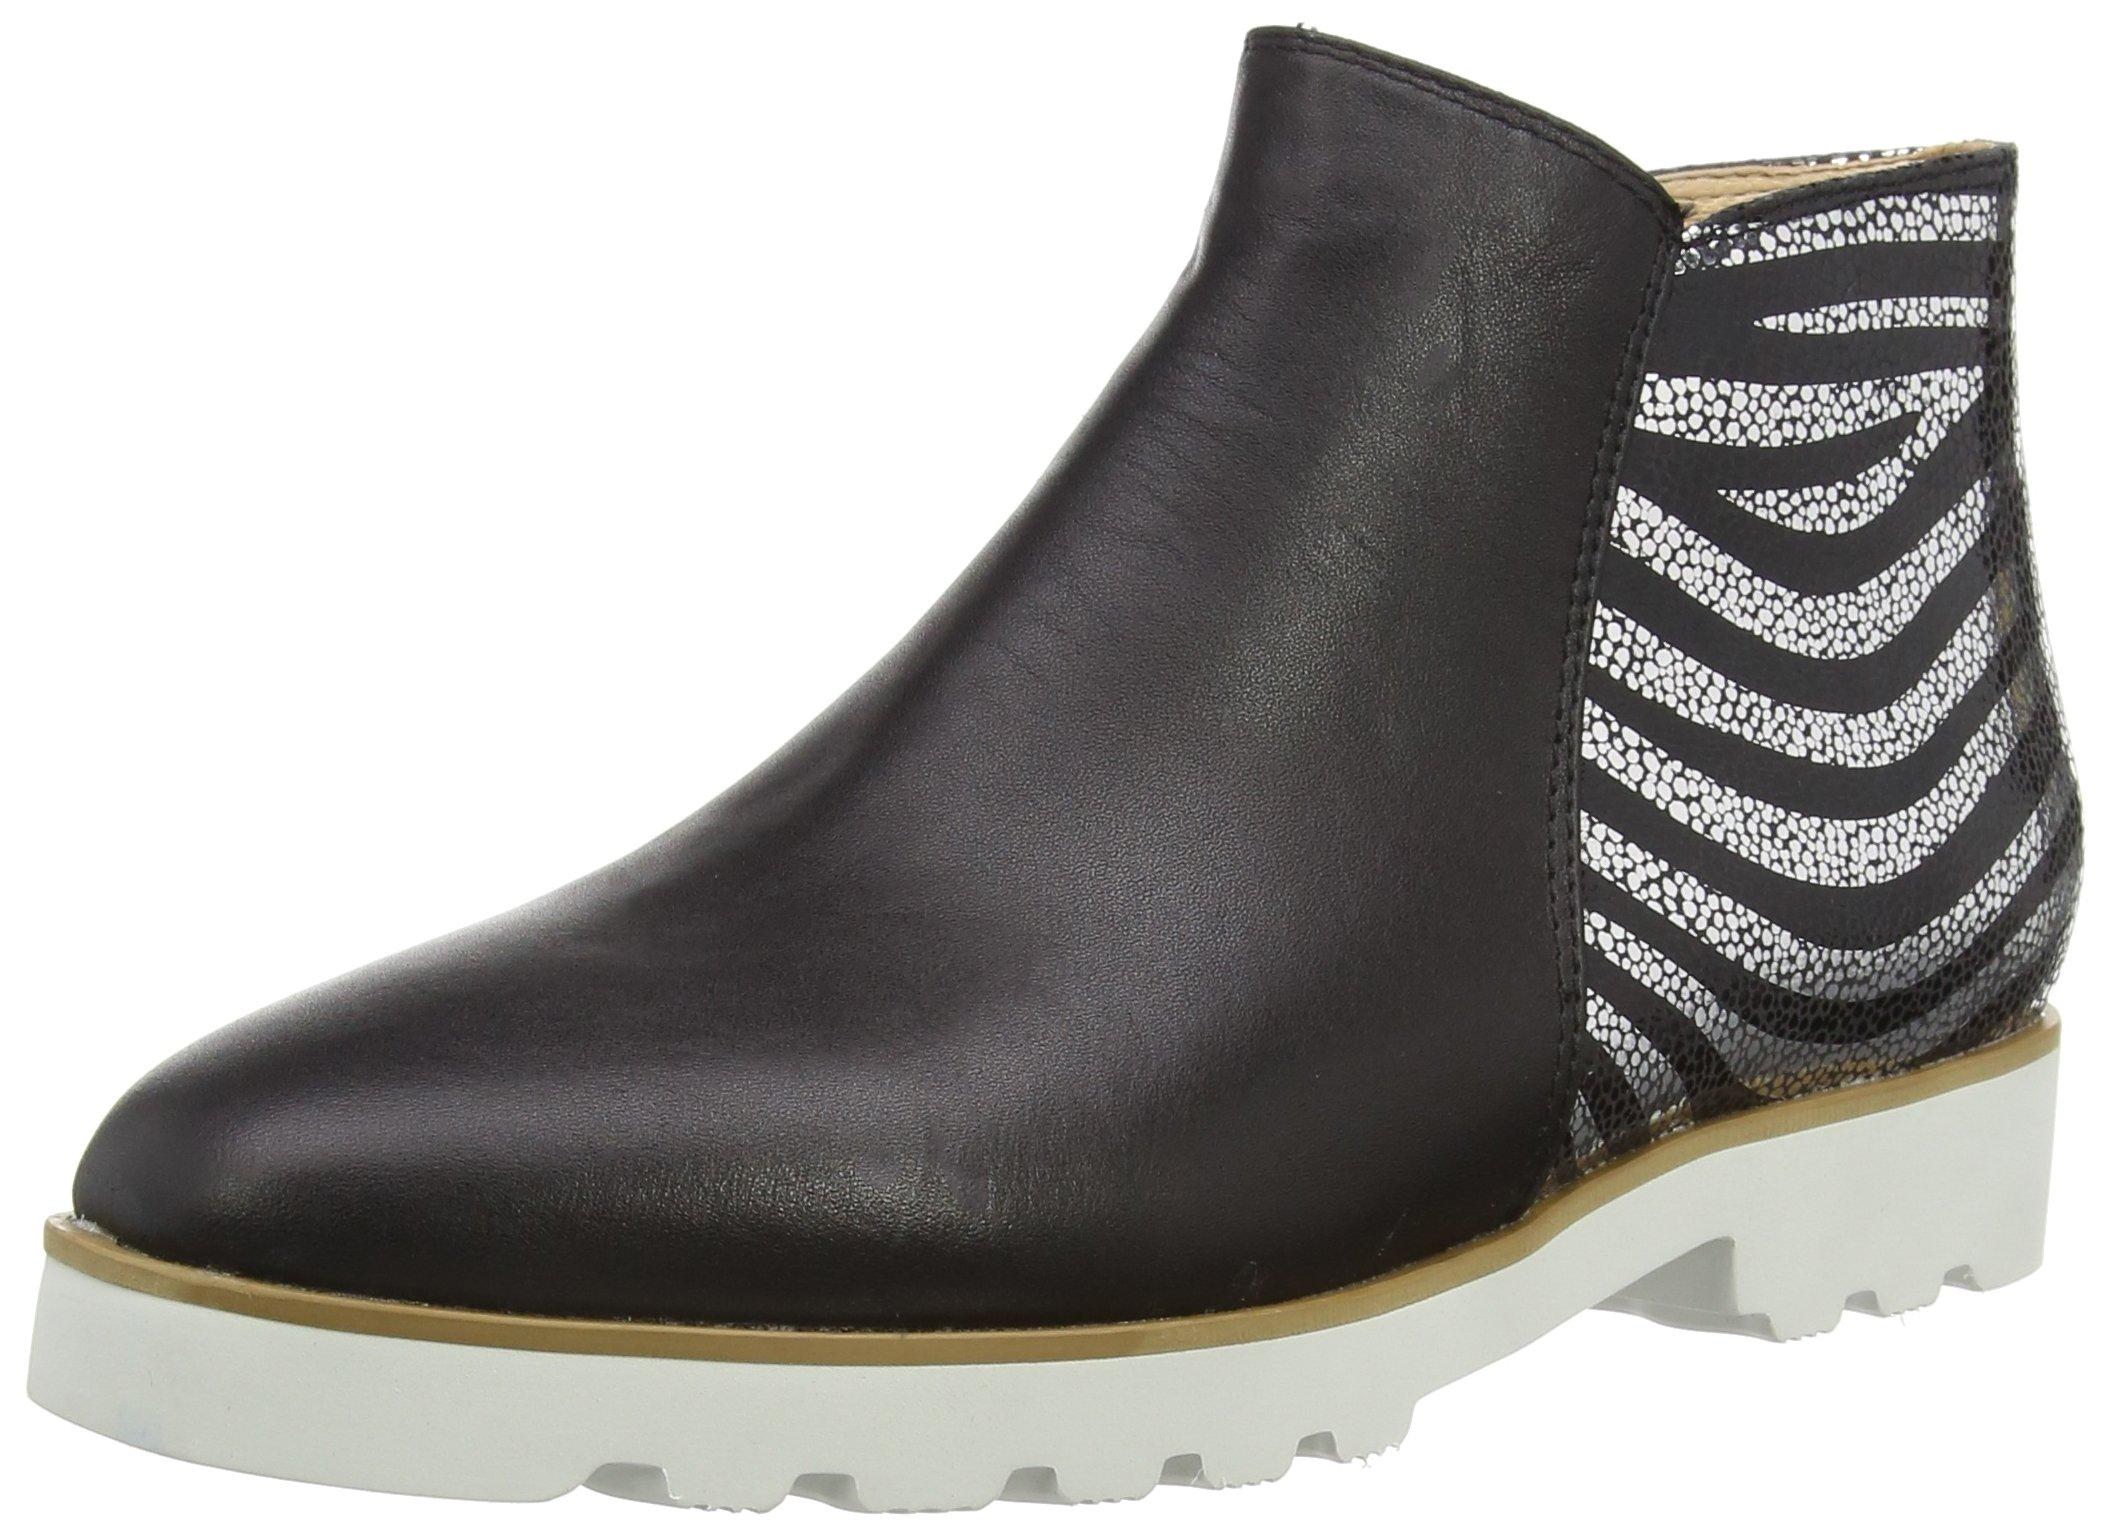 Ont8qt Eu Jycx15sb100 38 Schwarz Boots Black Giudecca Damen 1 508wqB0